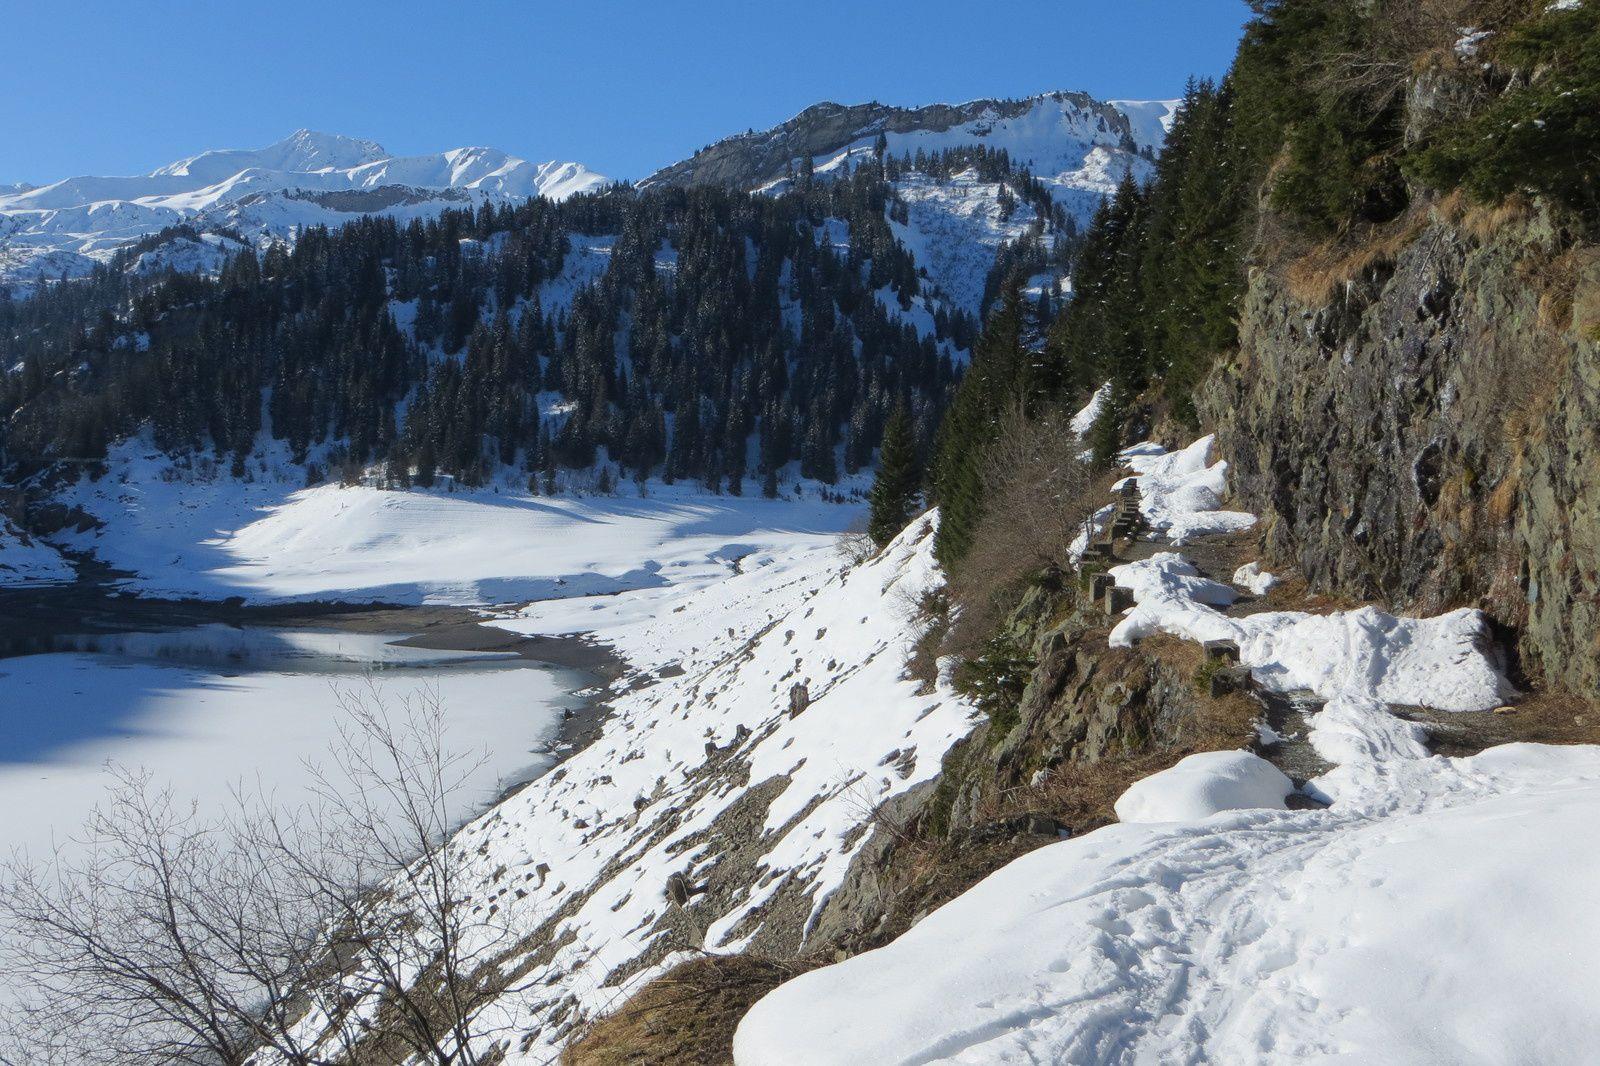 La piste longeant le barrage